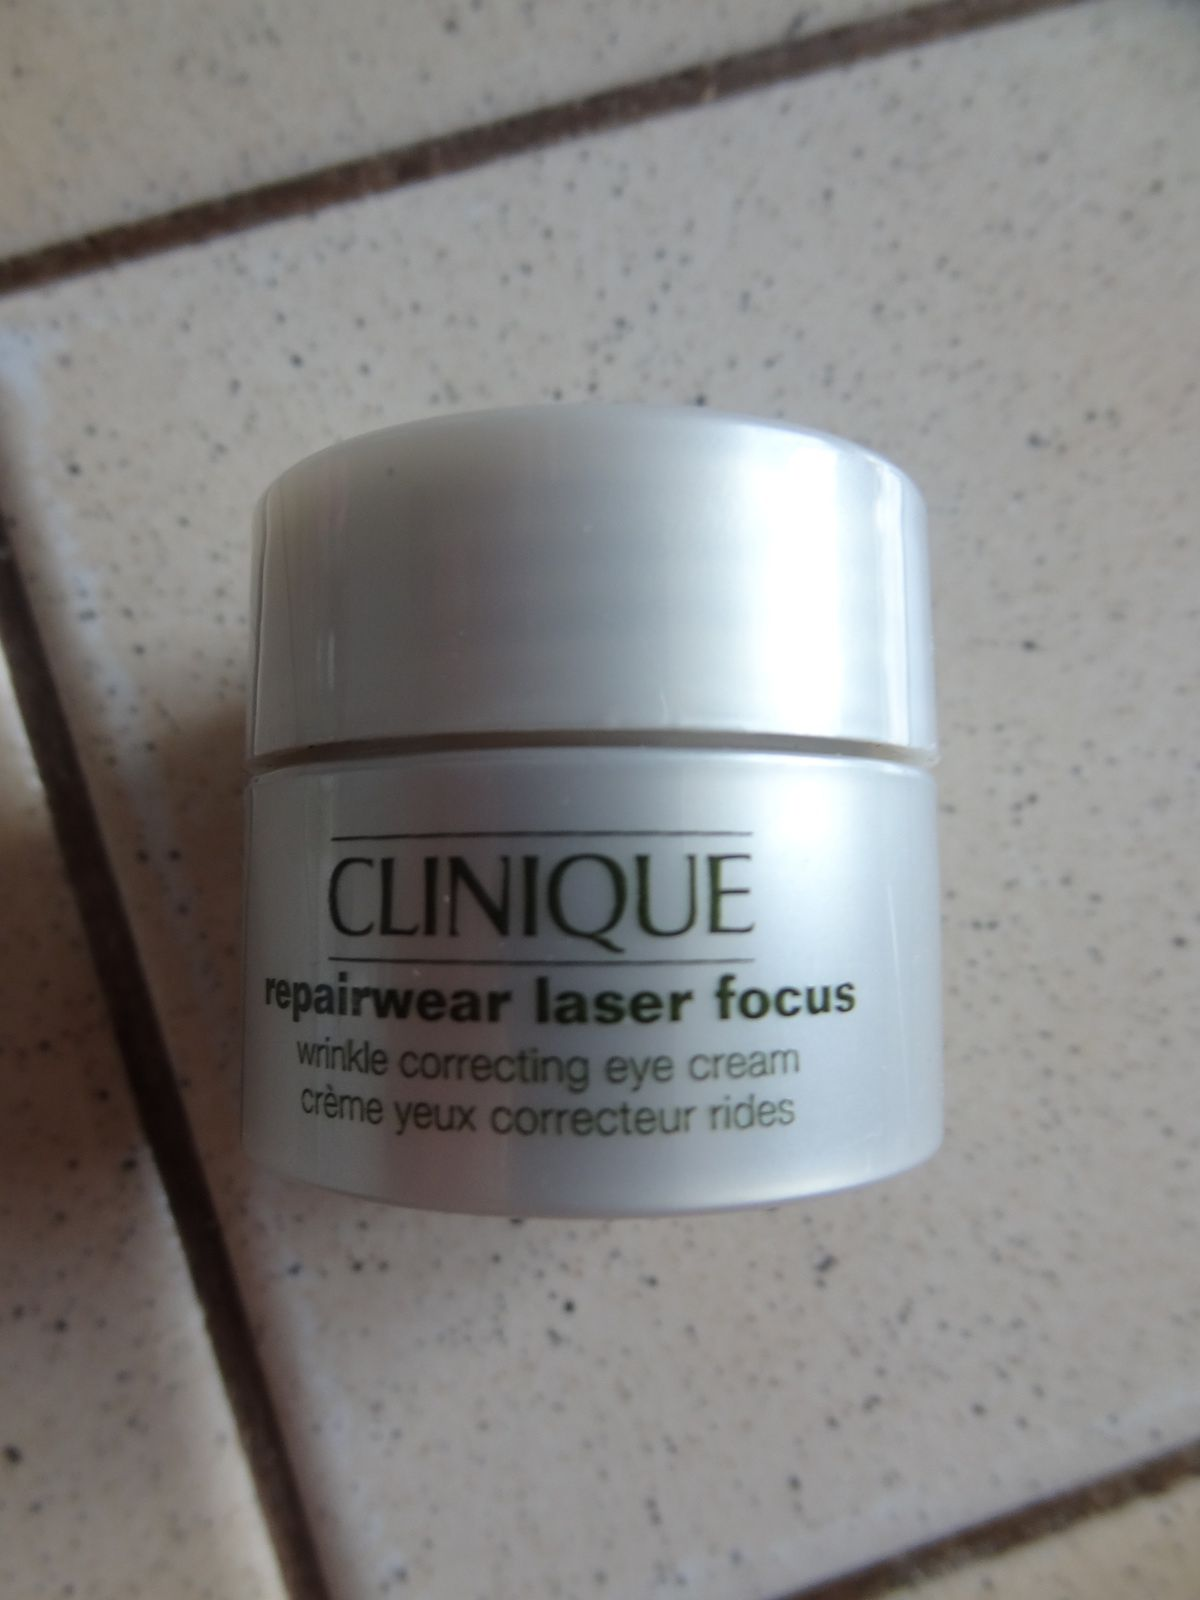 Repairwear laser focus yeux - Clinique